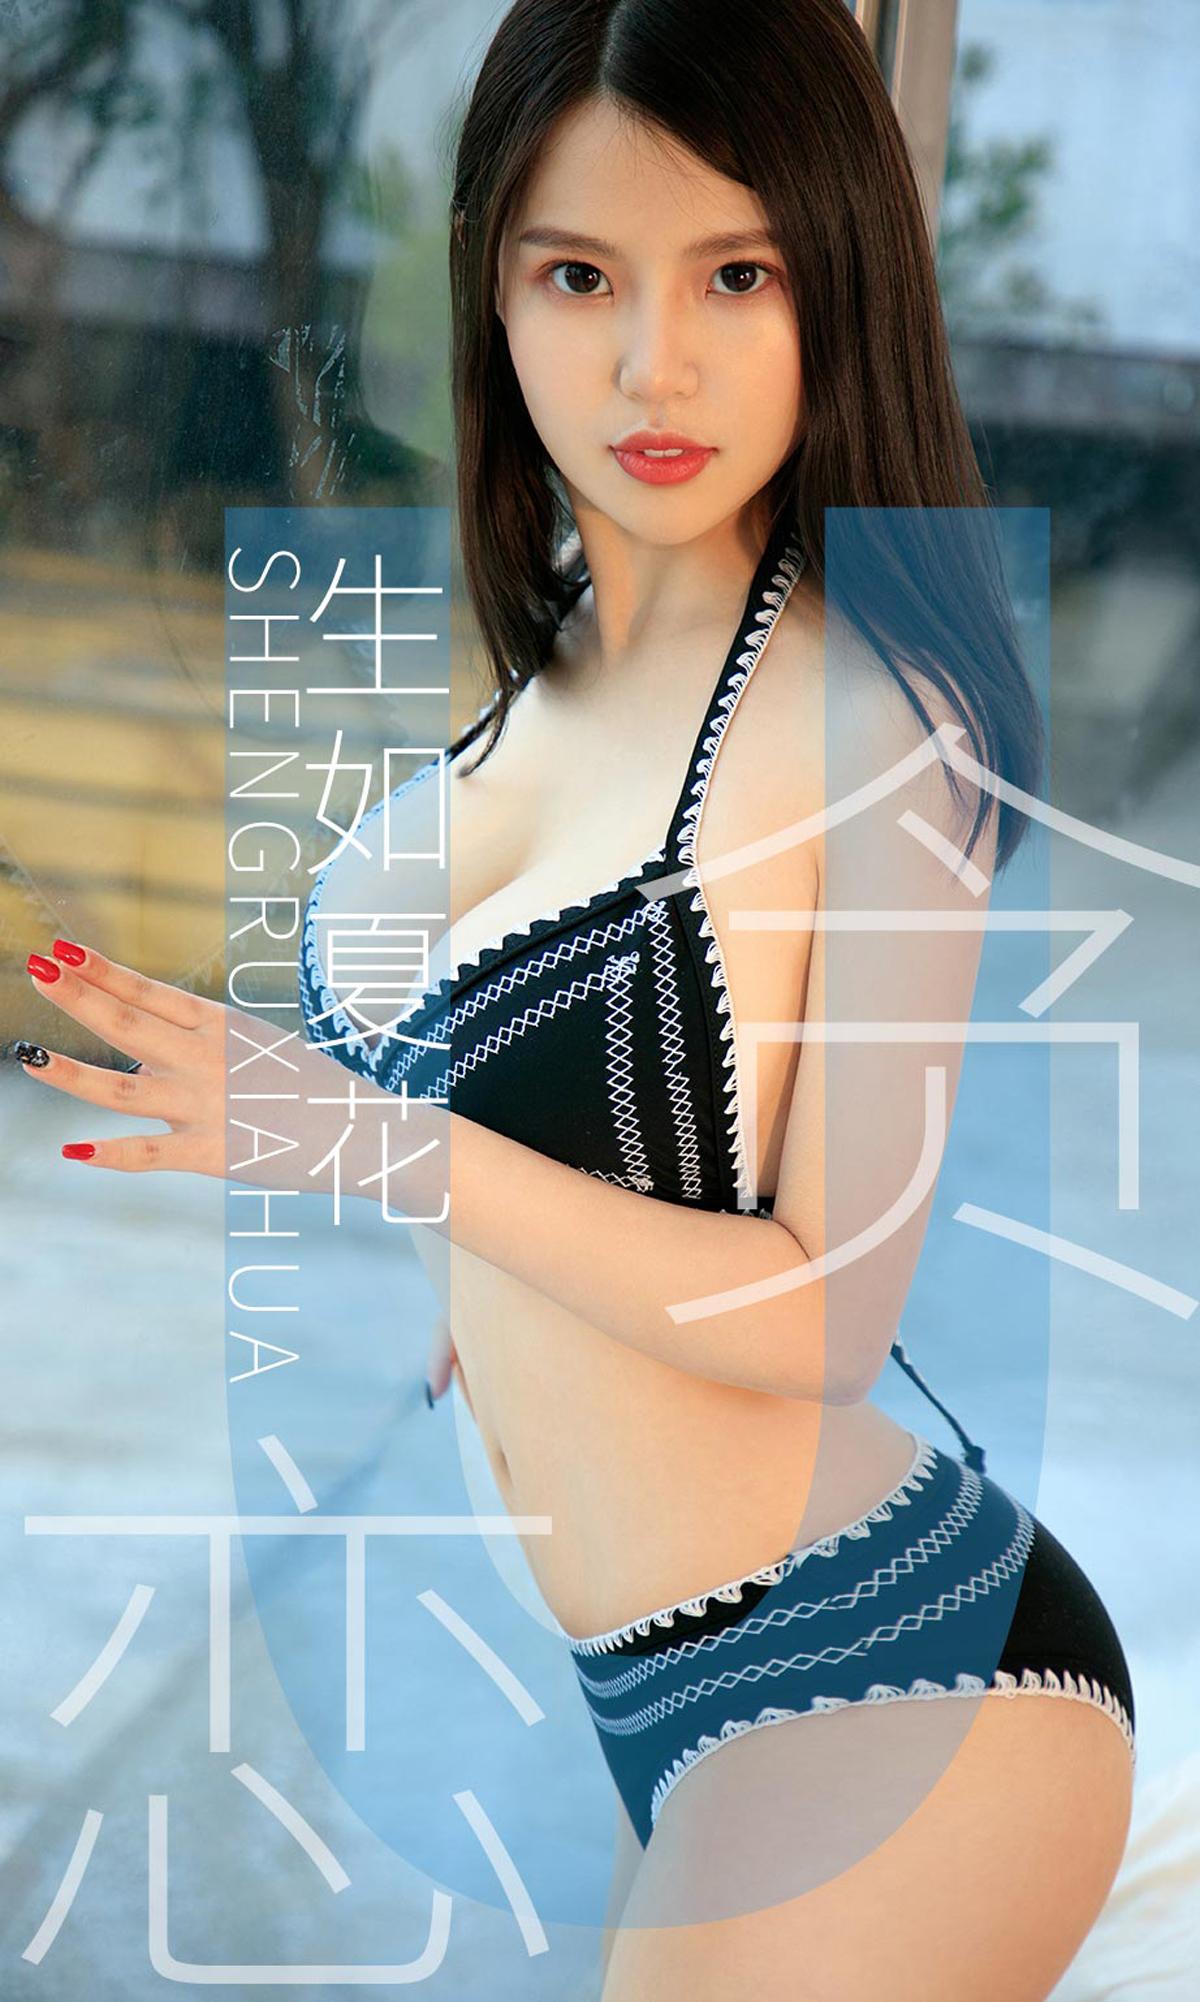 [Ugirls]爱尤物 No.1435 生如夏花 贪恋 [3